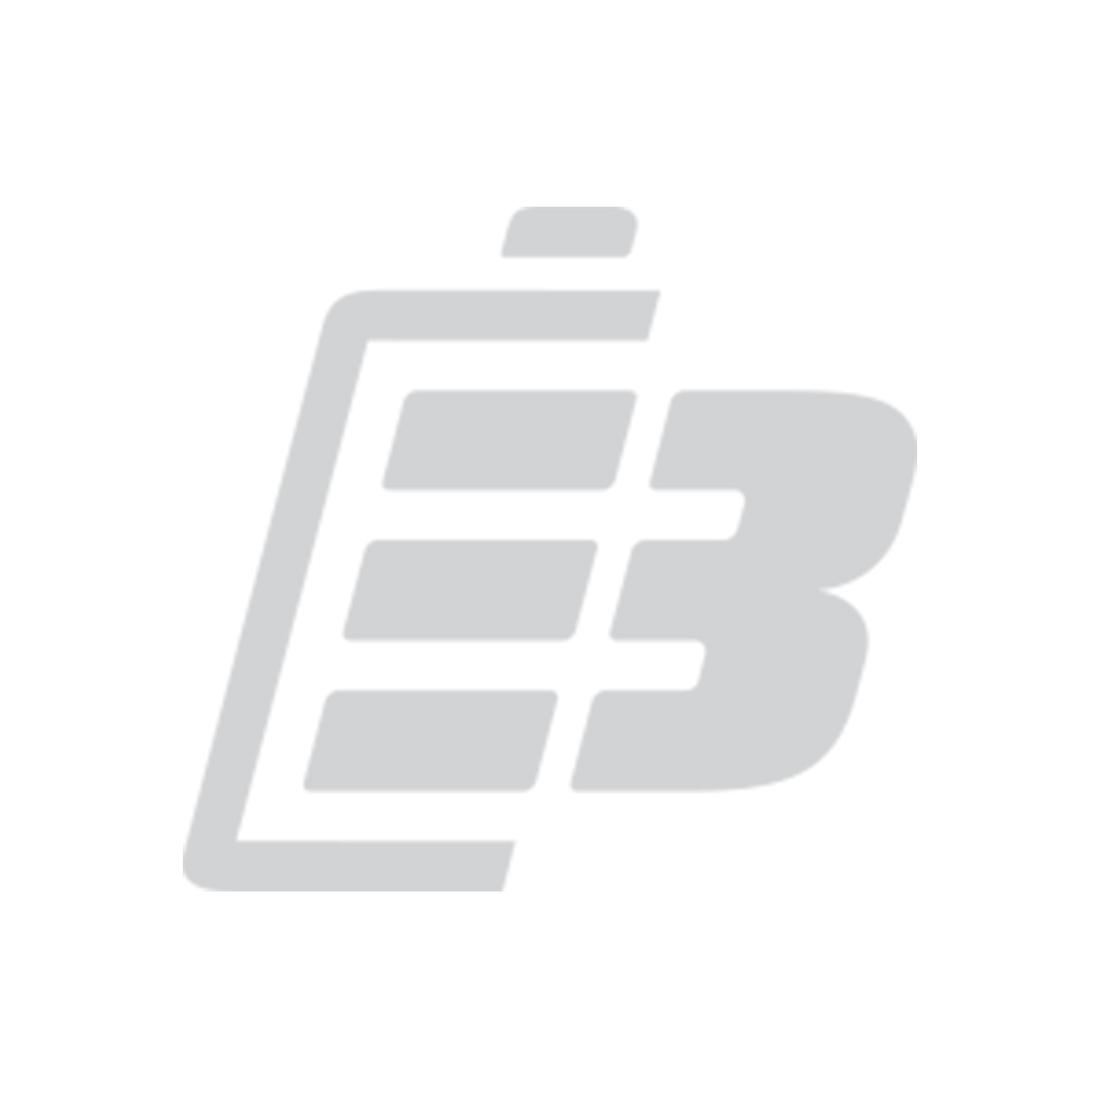 Wireless router battery Huawei E587 mobile WIFI 4G_1